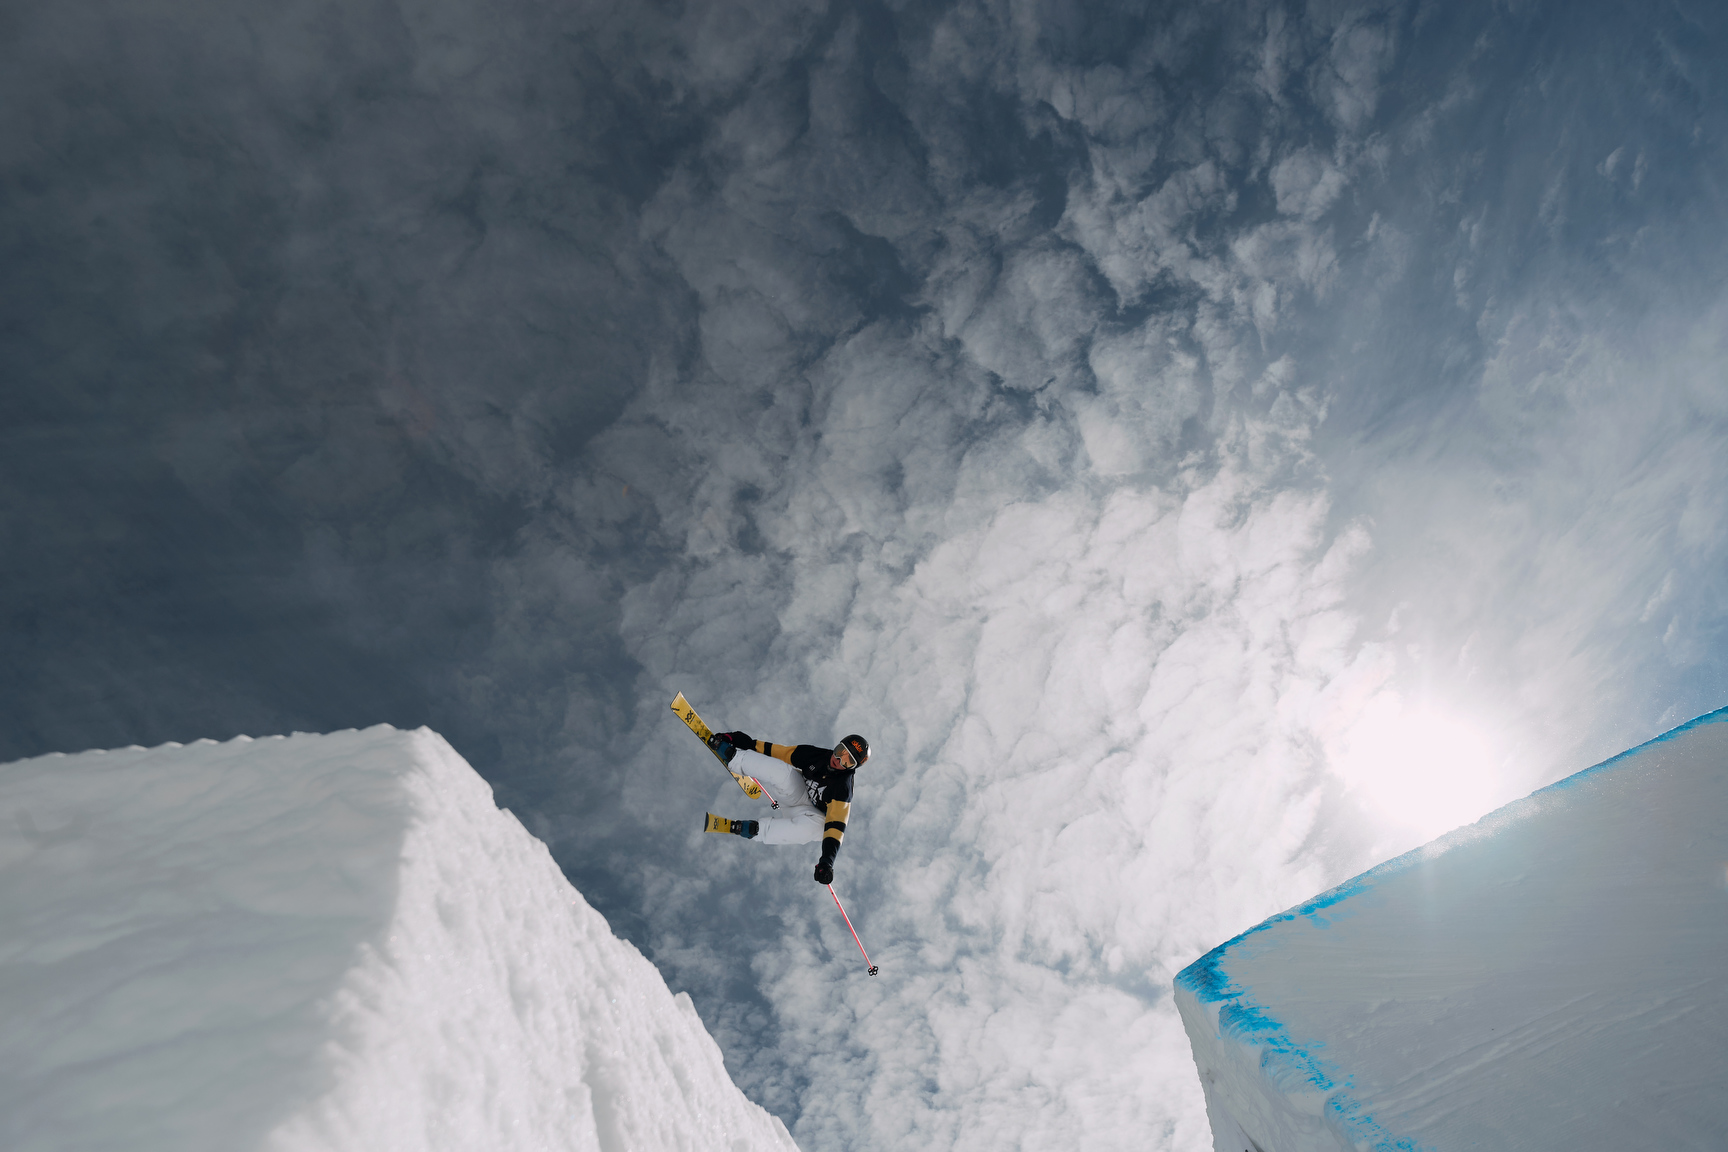 Birk Ruud, M Ski Slopestyle